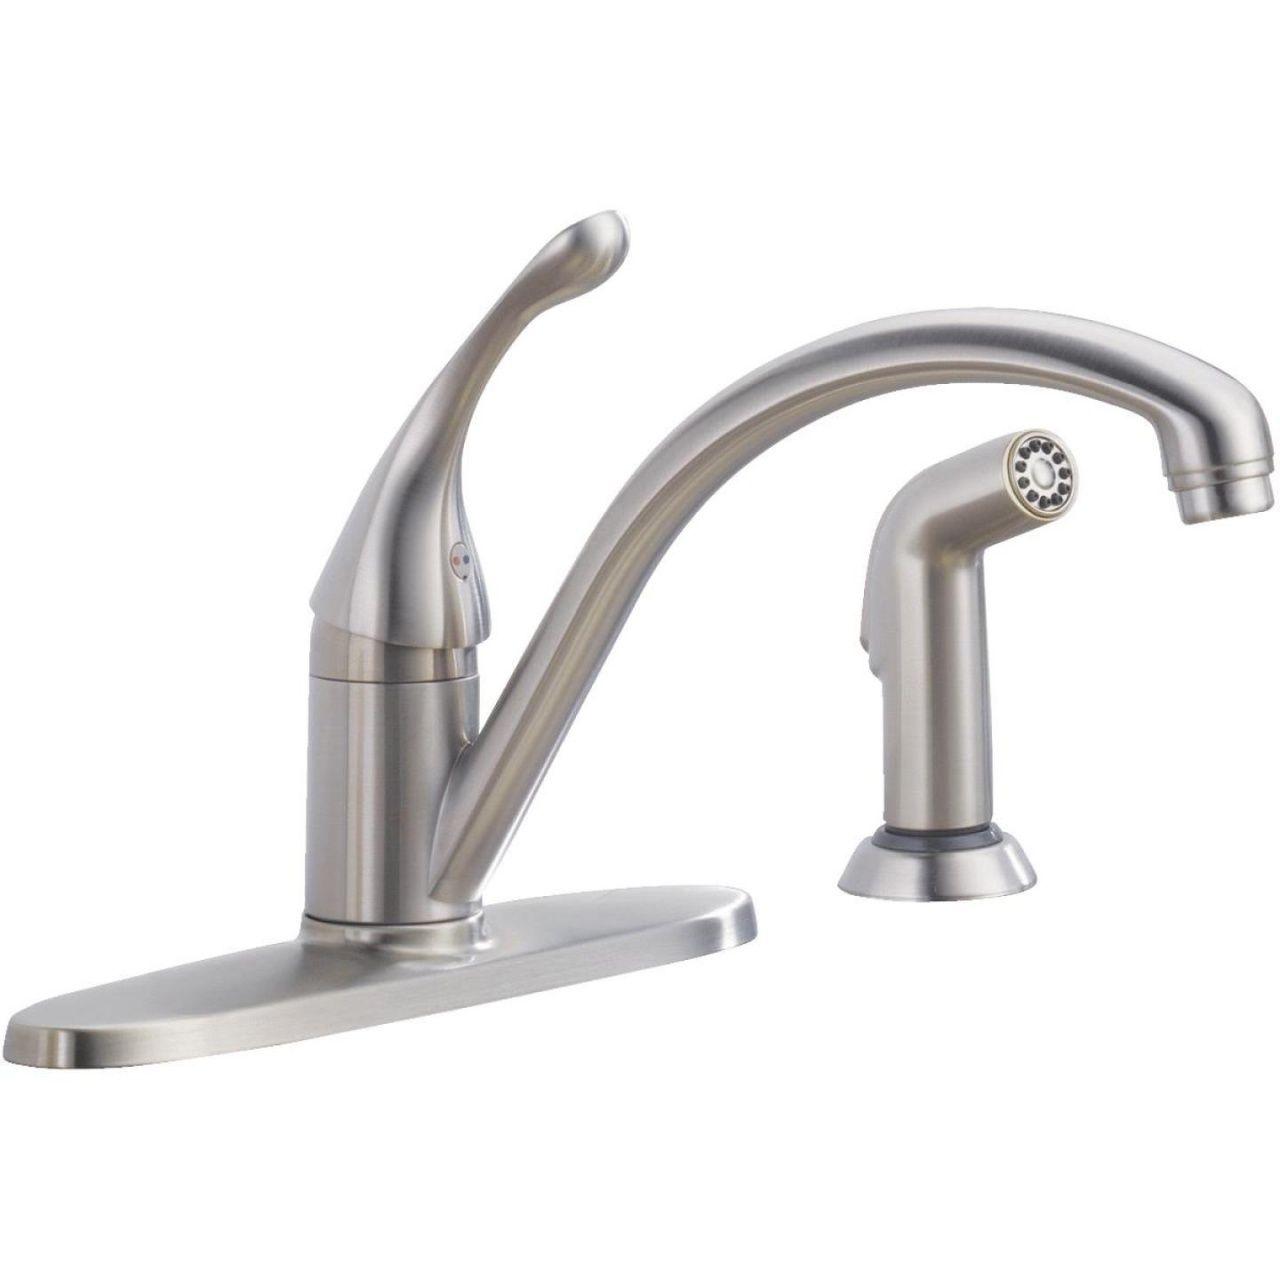 Delta Single Handle Kitchen Faucet Repair Kit In 2020 Kitchen